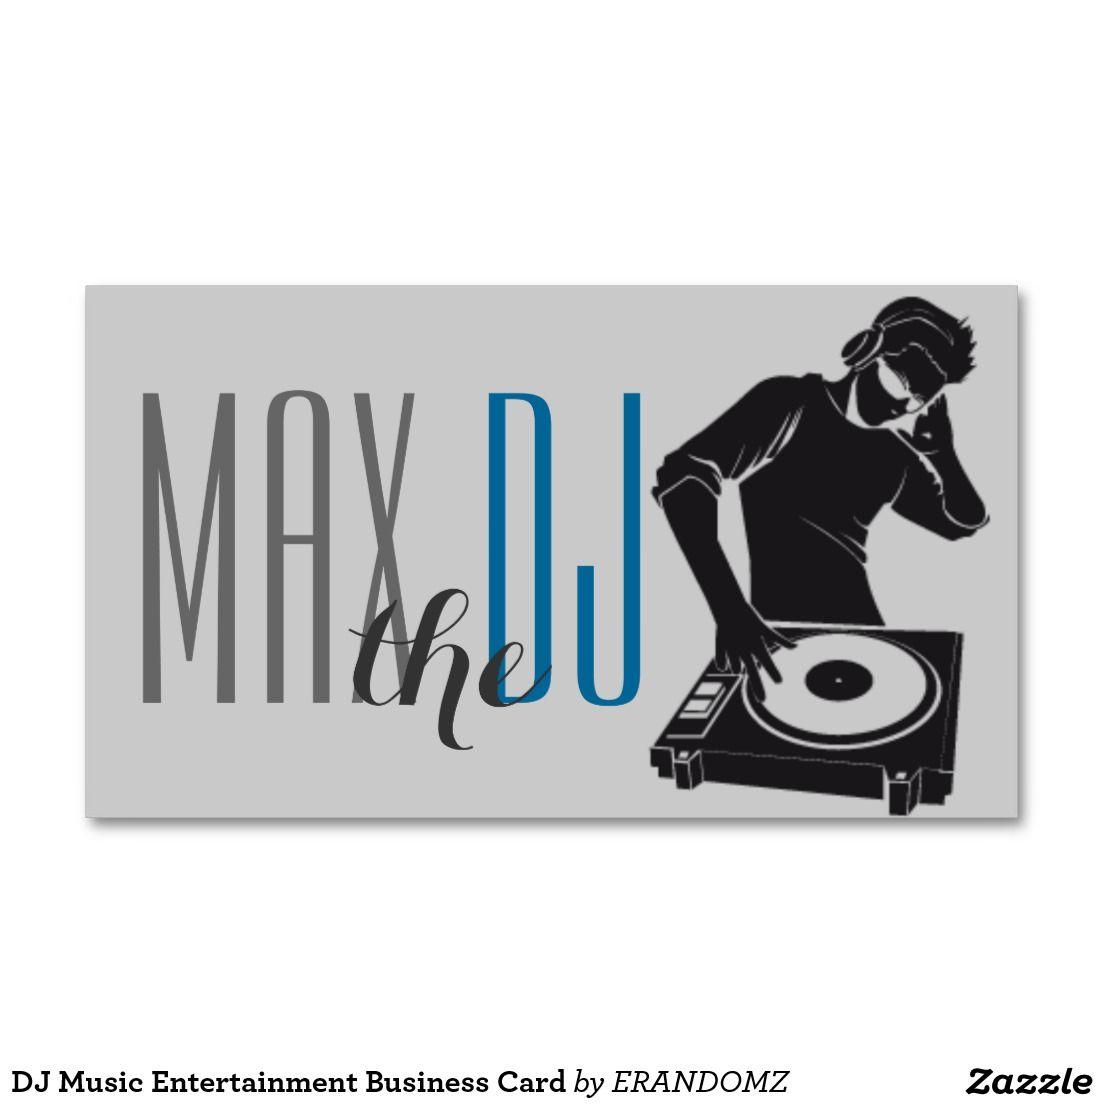 Dj music entertainment business card dj business cards pinterest dj music entertainment business card reheart Gallery